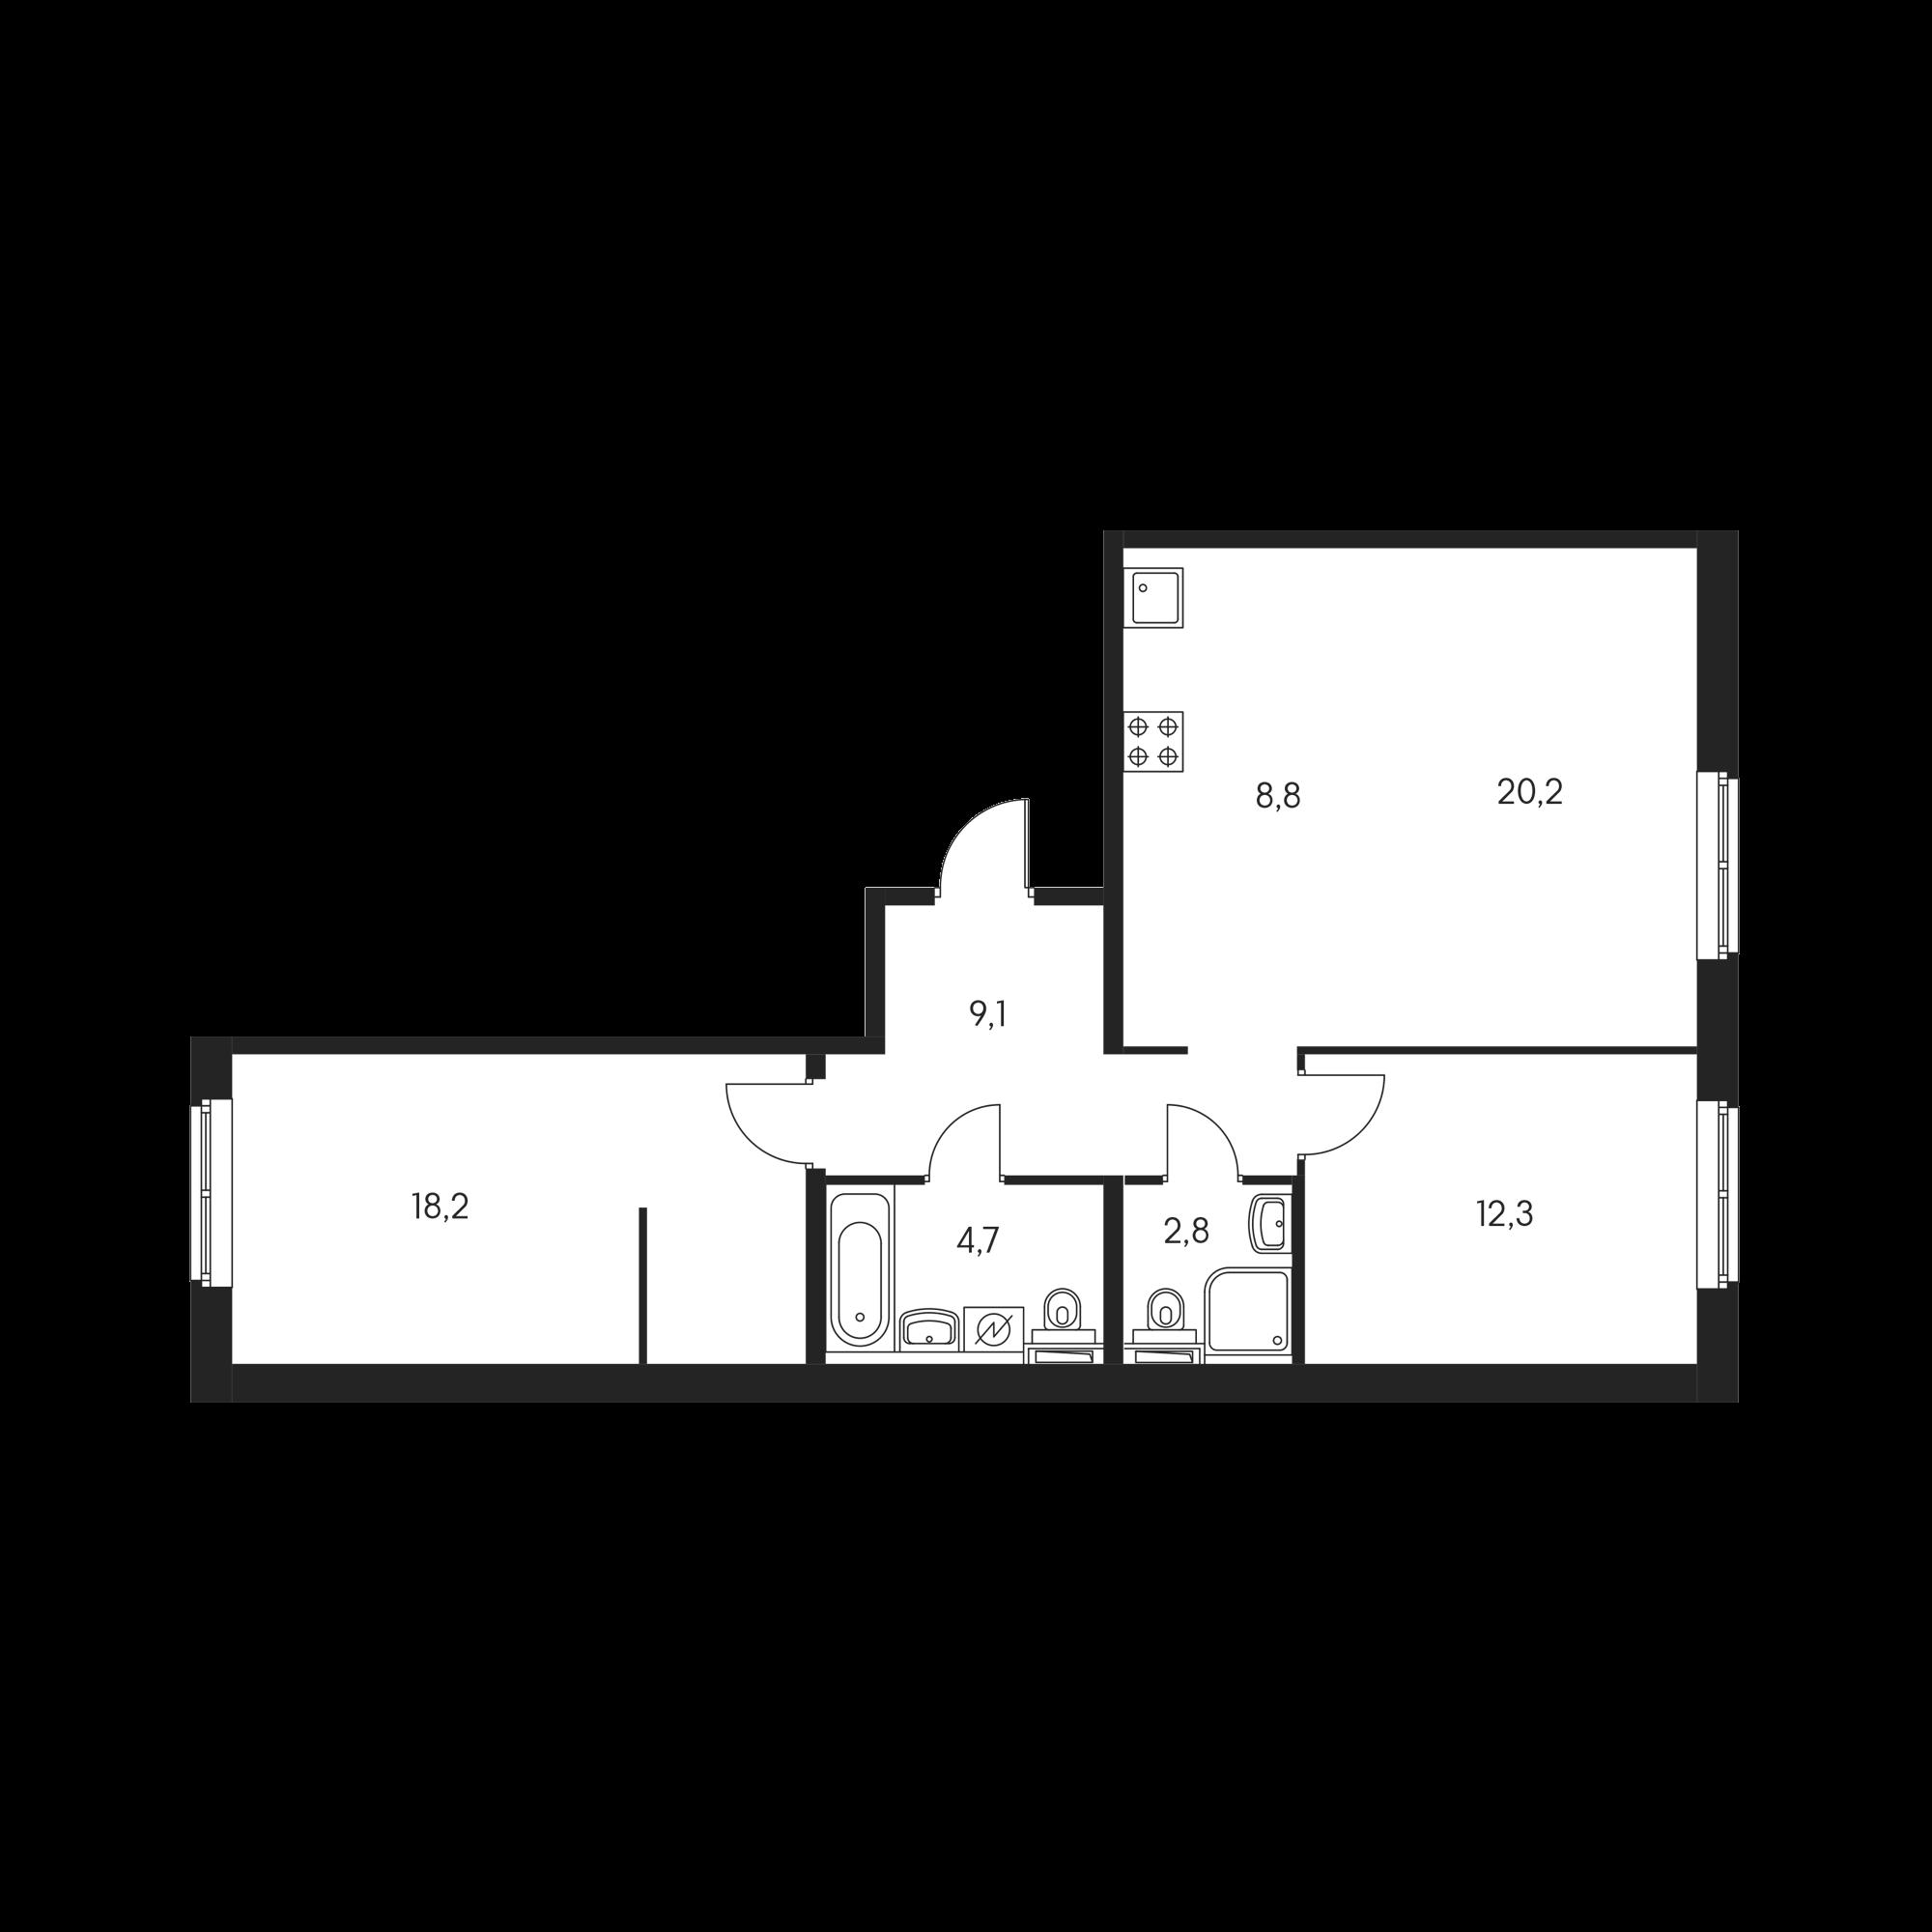 3KM12_8.4-1